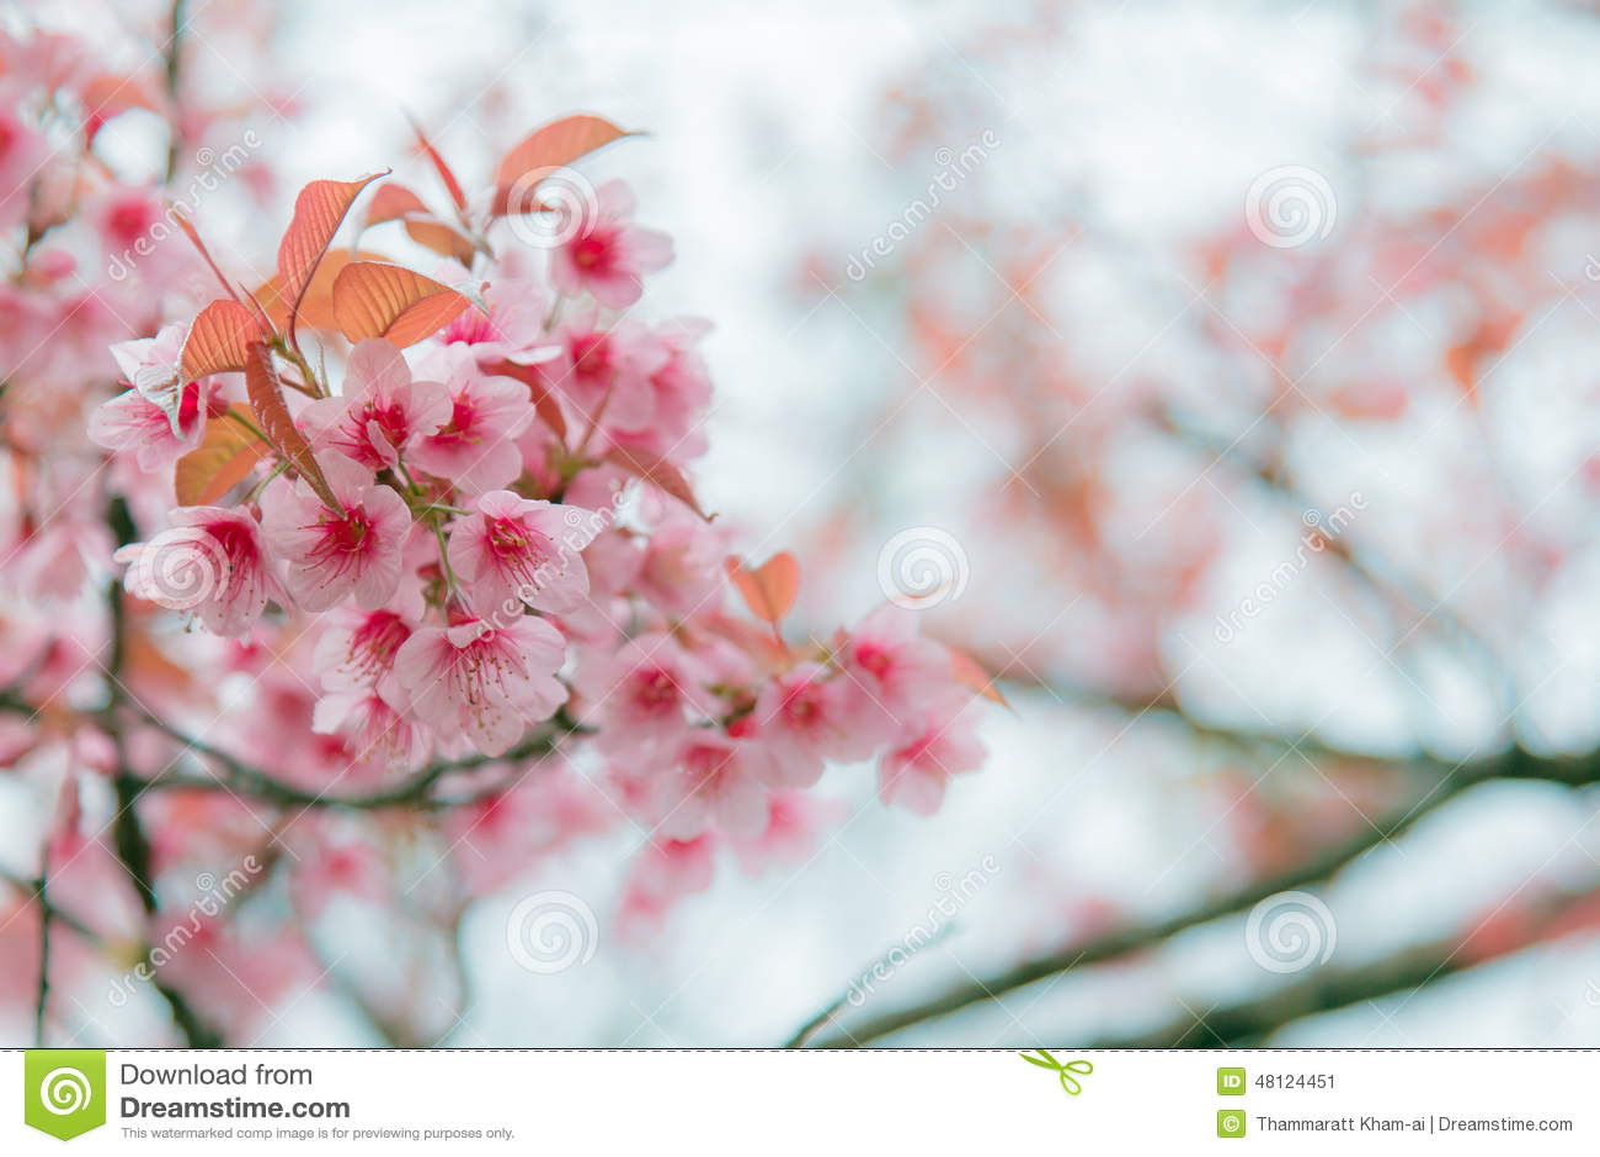 fleurs d 39 hiver image stock image du himalayan floraison 48124451. Black Bedroom Furniture Sets. Home Design Ideas